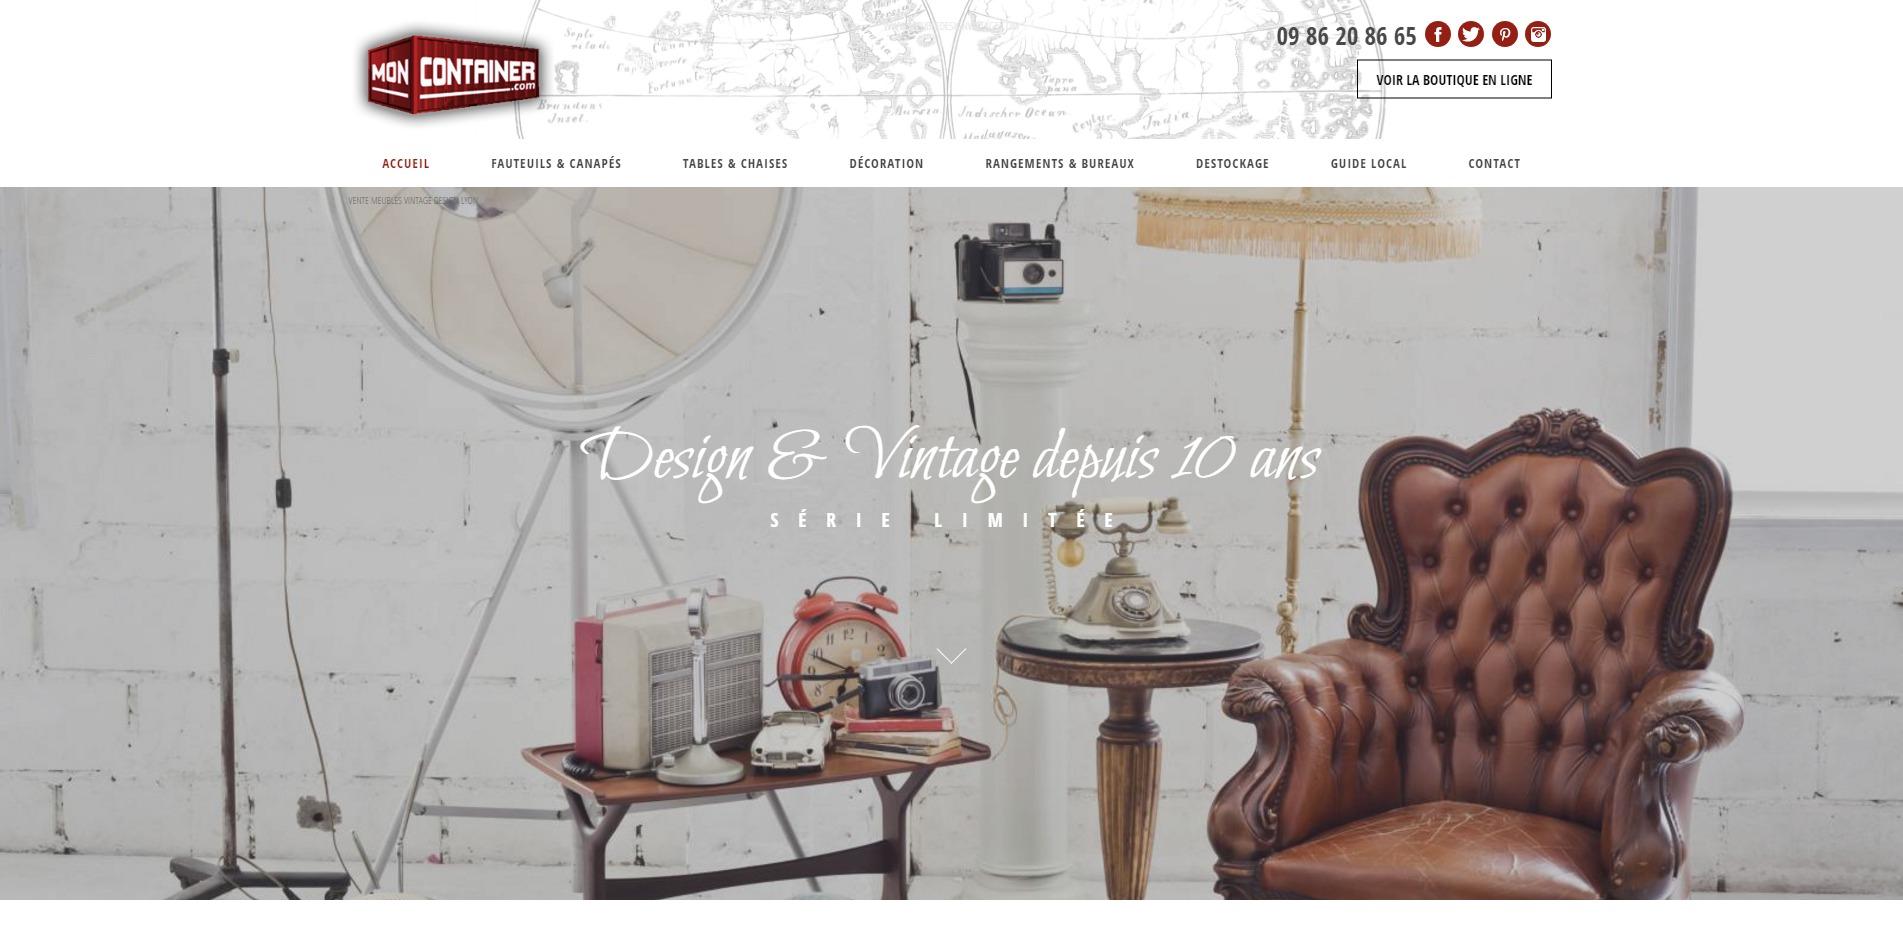 vente en ligne de meubles design et vintage moncontainer. Black Bedroom Furniture Sets. Home Design Ideas